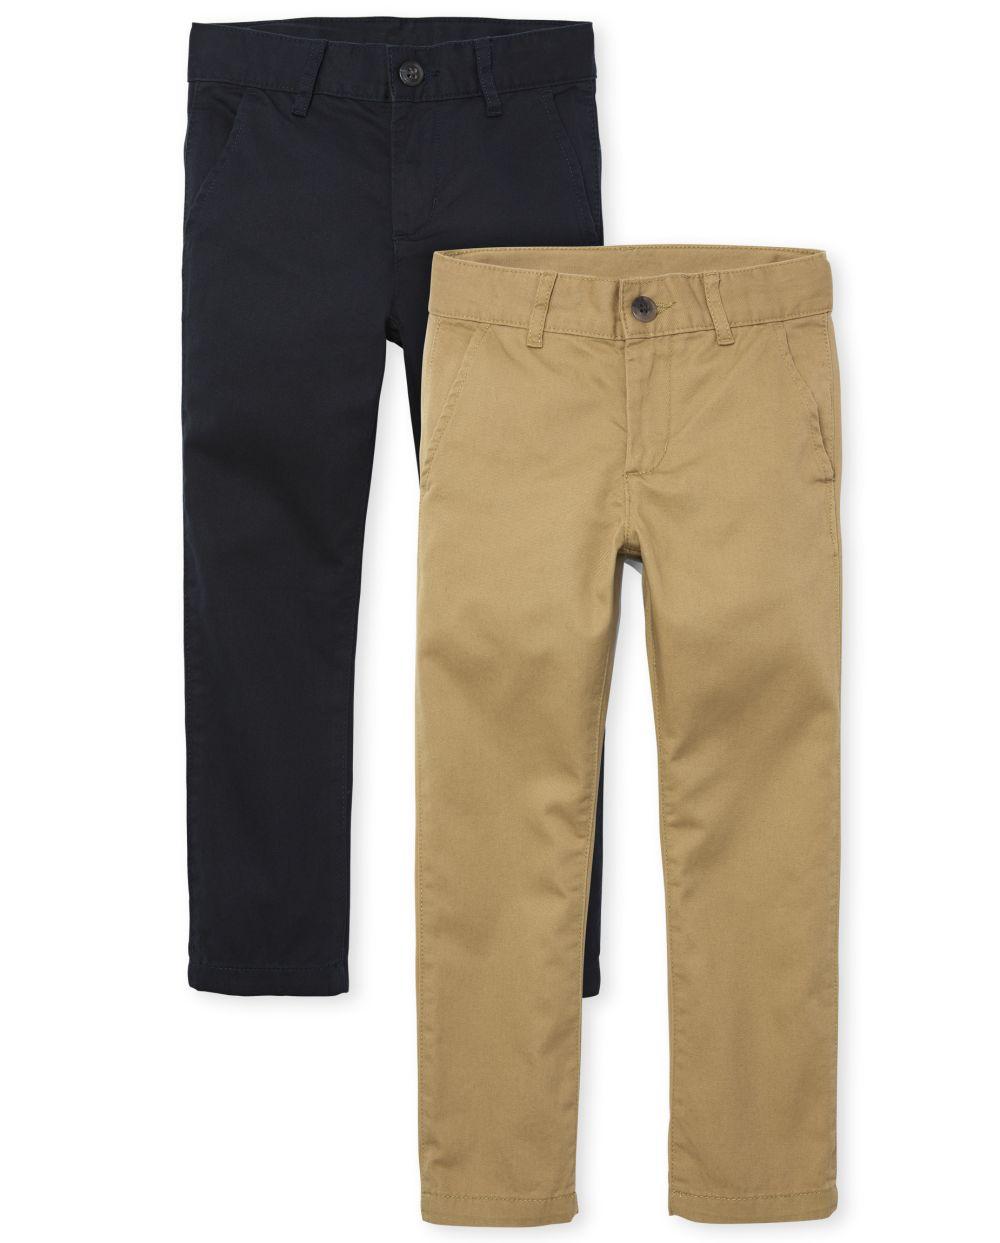 Boys Stretch Skinny Chino Pants 2-Pack - Multi